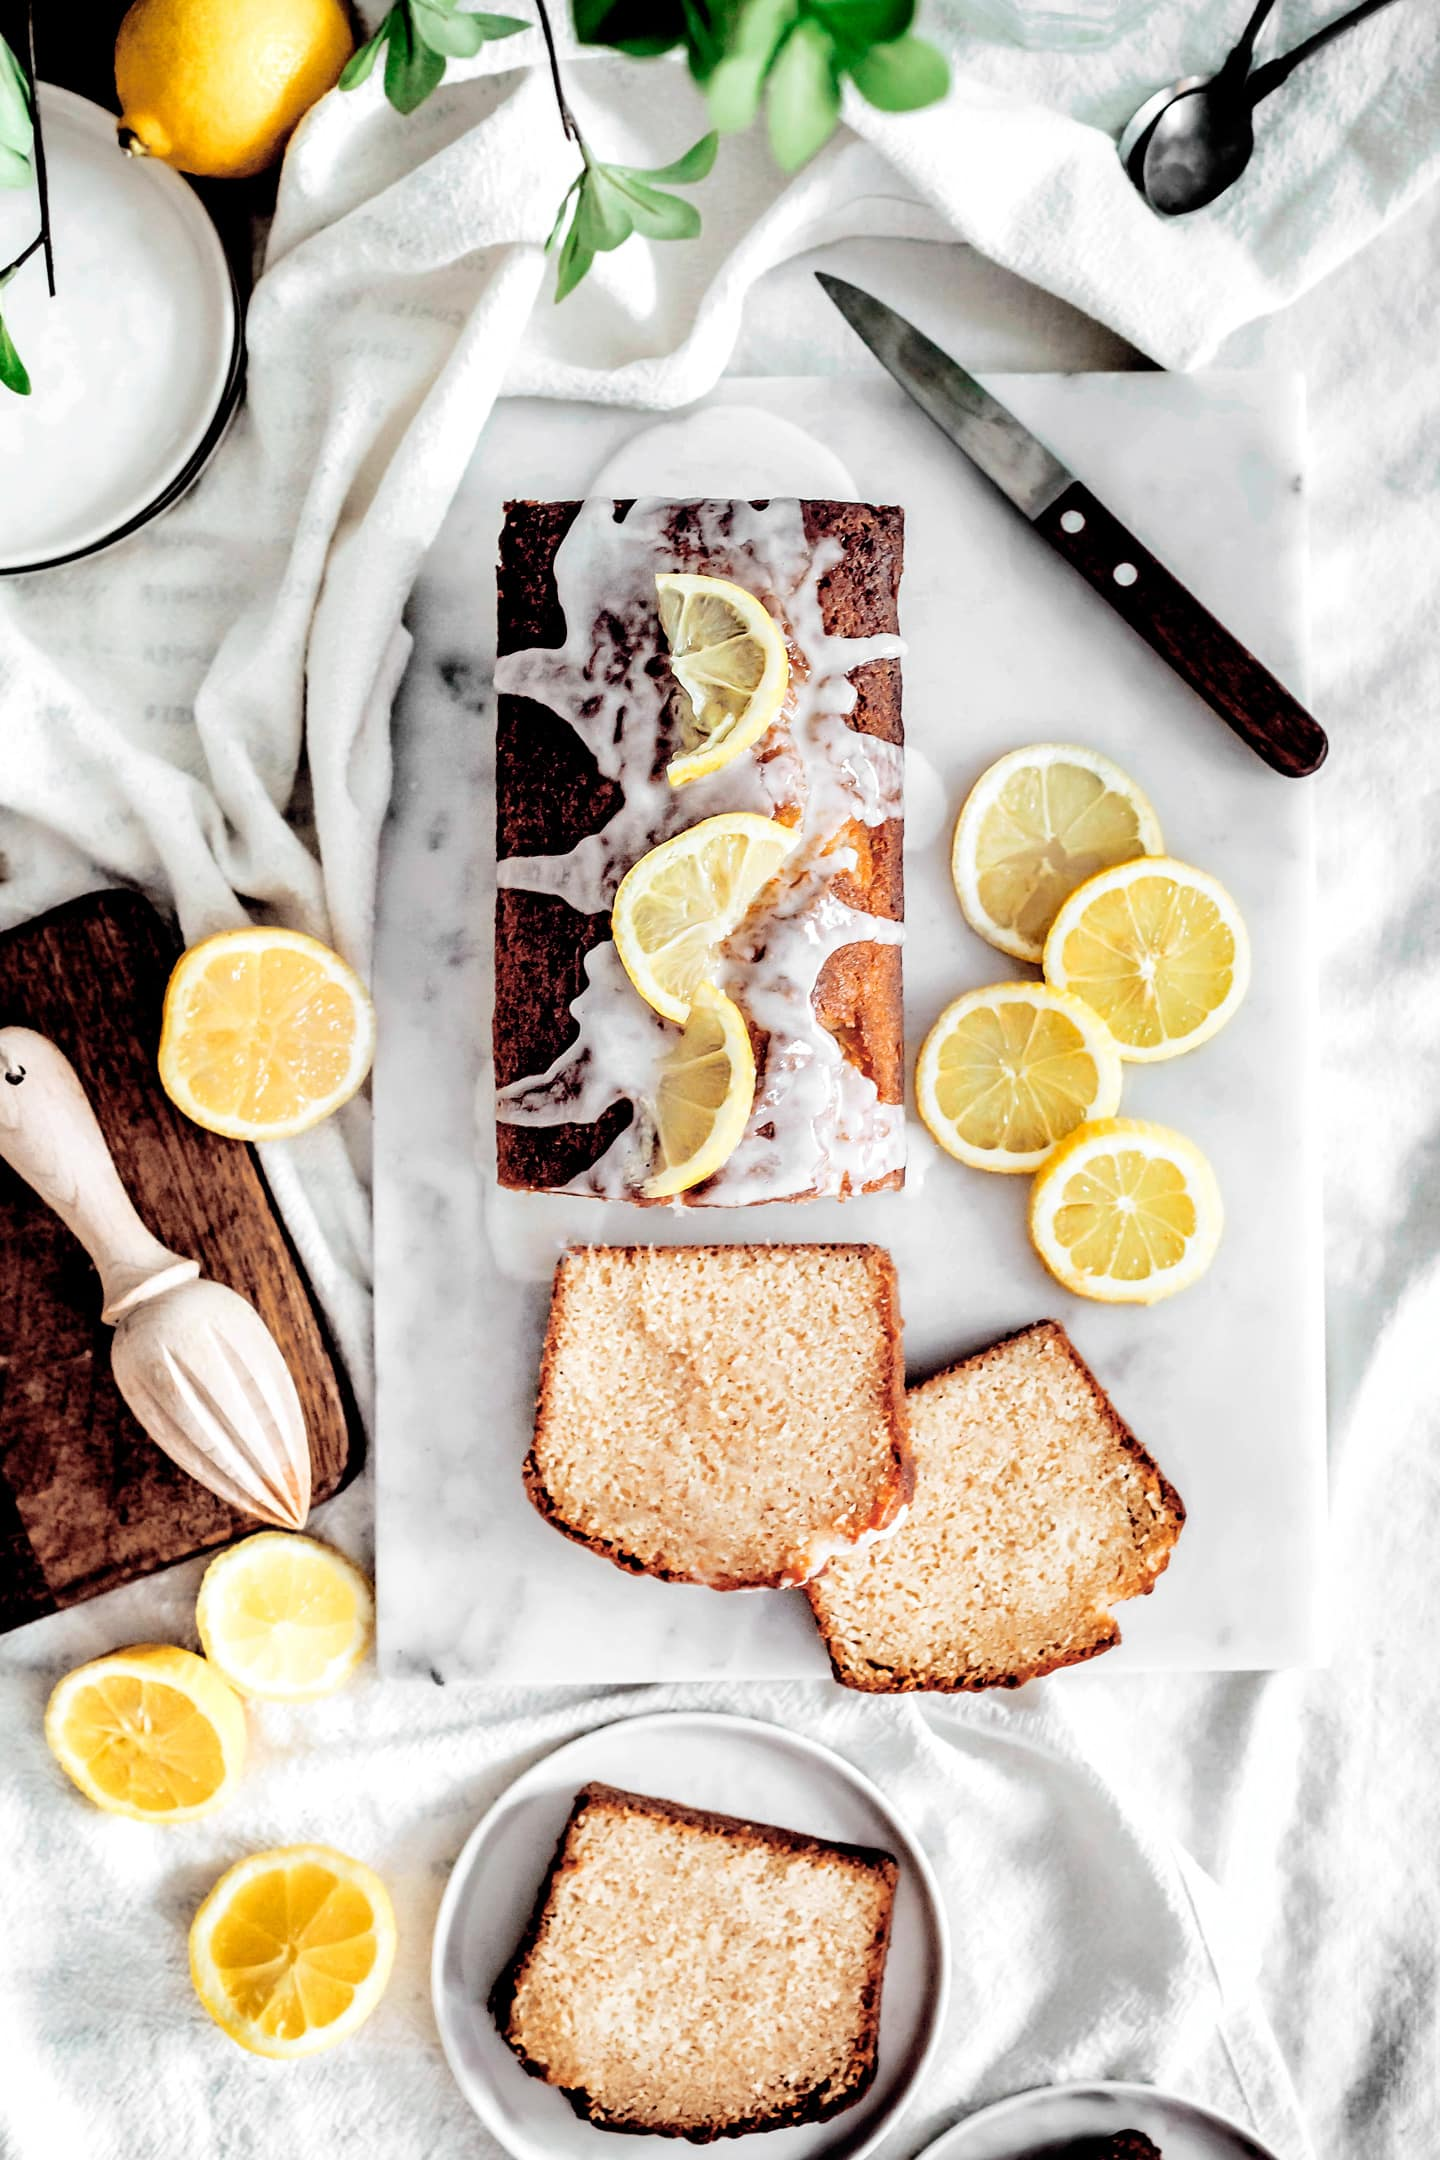 yellow lemon fondant cake